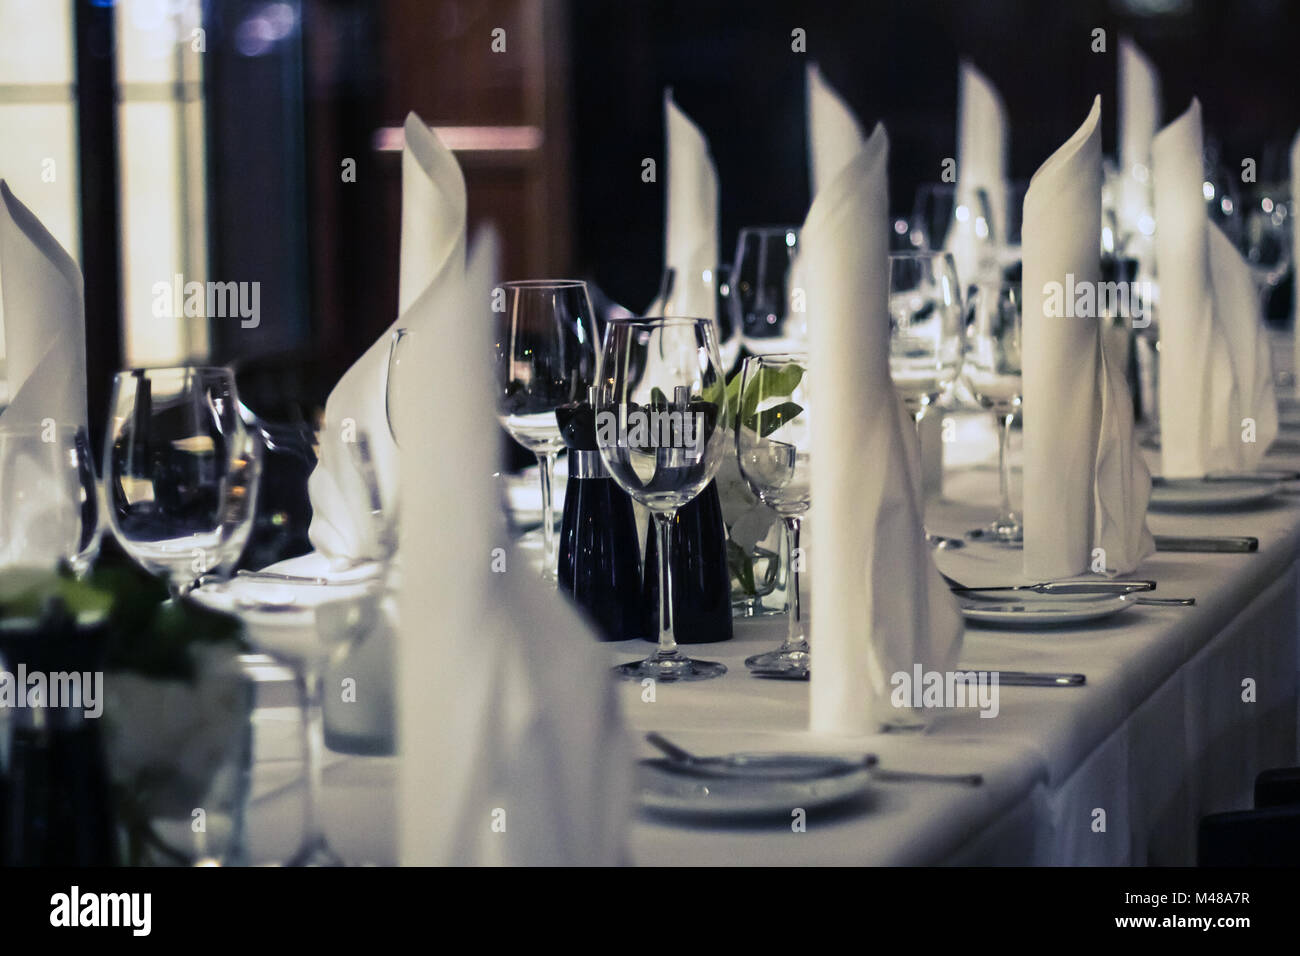 Decoradas mesa - concepto de restaurante de ambiente Imagen De Stock